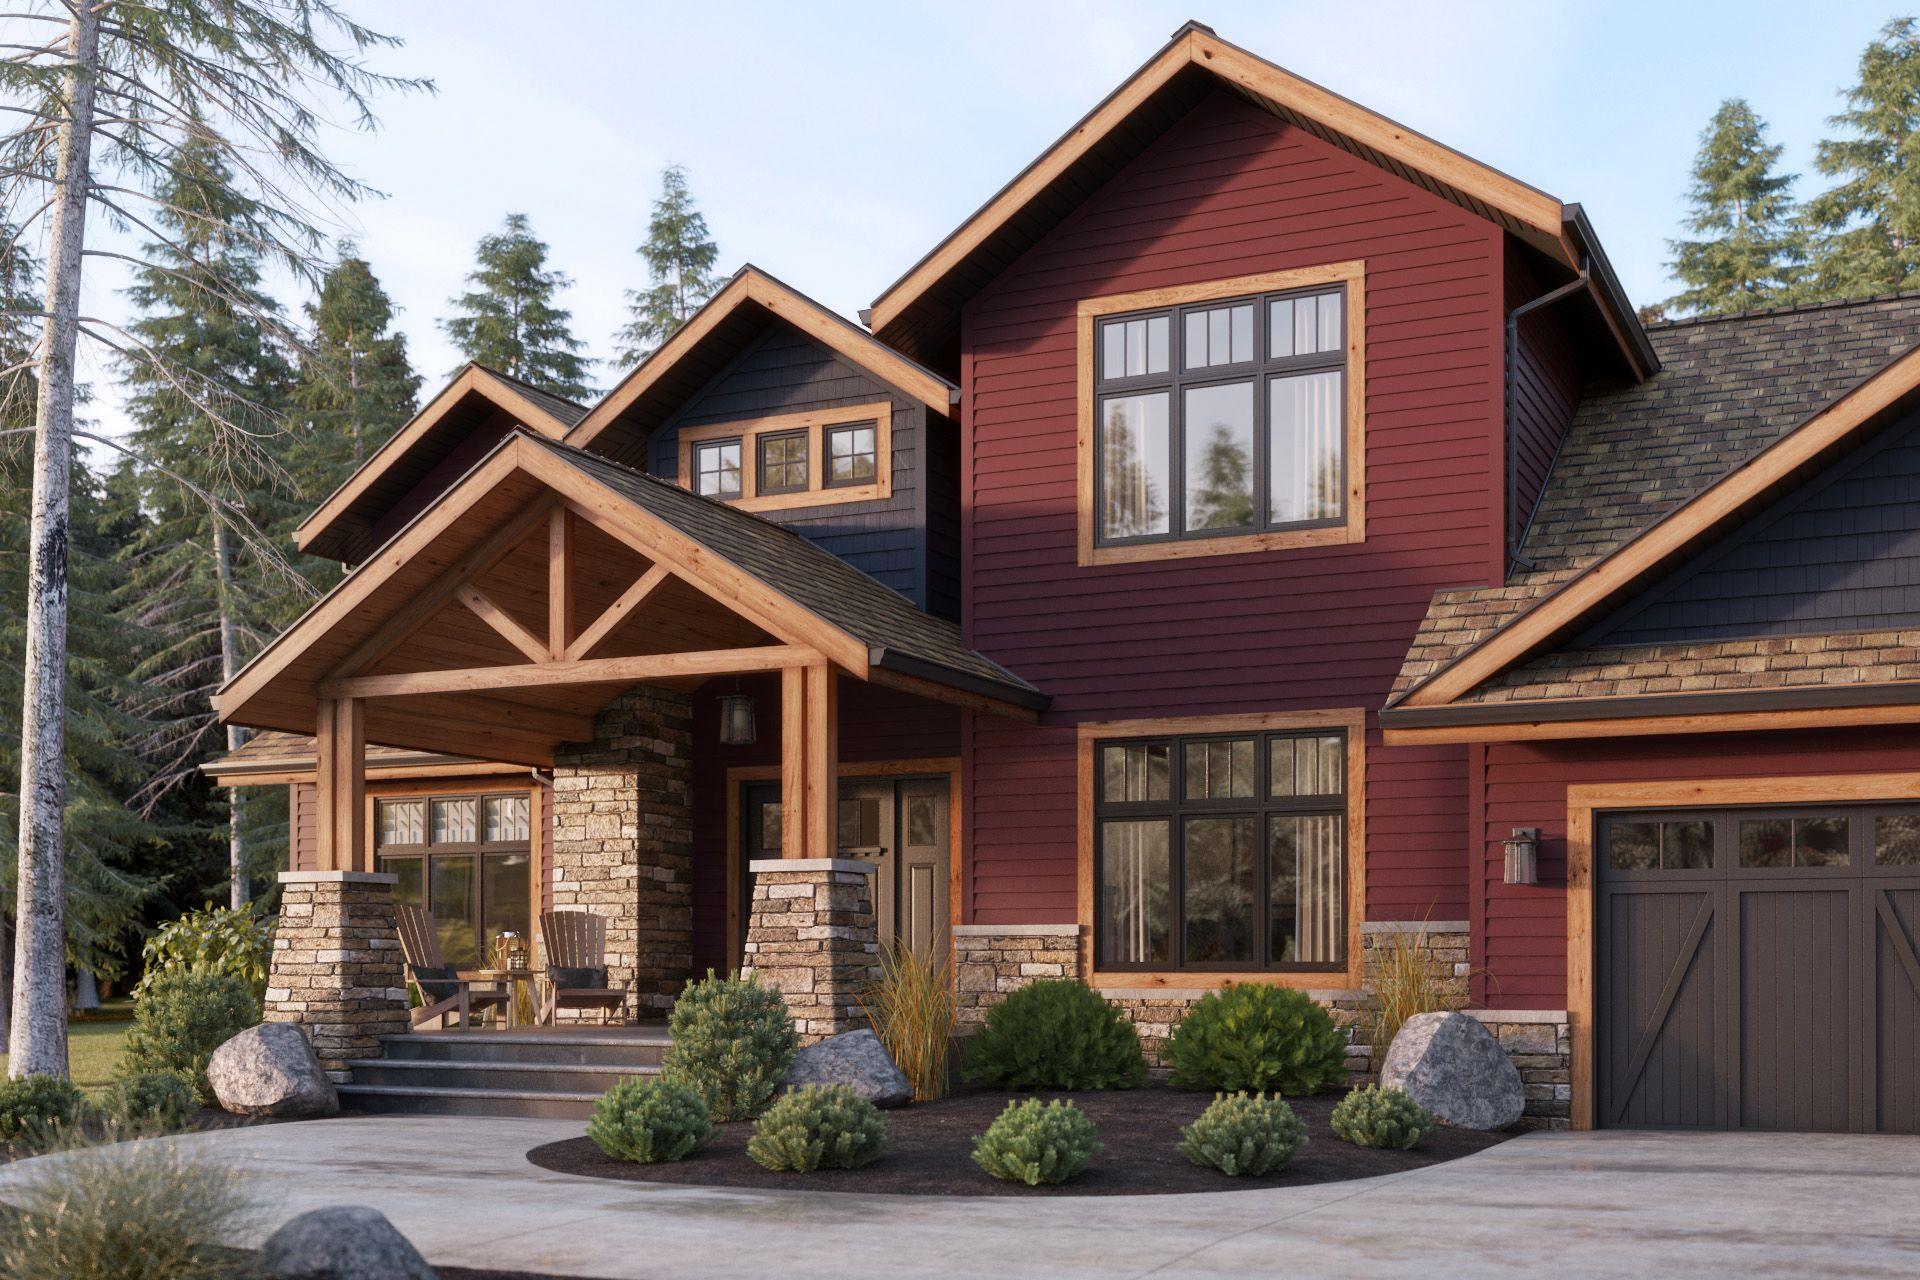 Ply Gem Solardefense Red Brick Pr1015 Red House Exterior Exterior Paint Colors For House House Paint Exterior,Baby Shower Decorations Ideas Pinterest